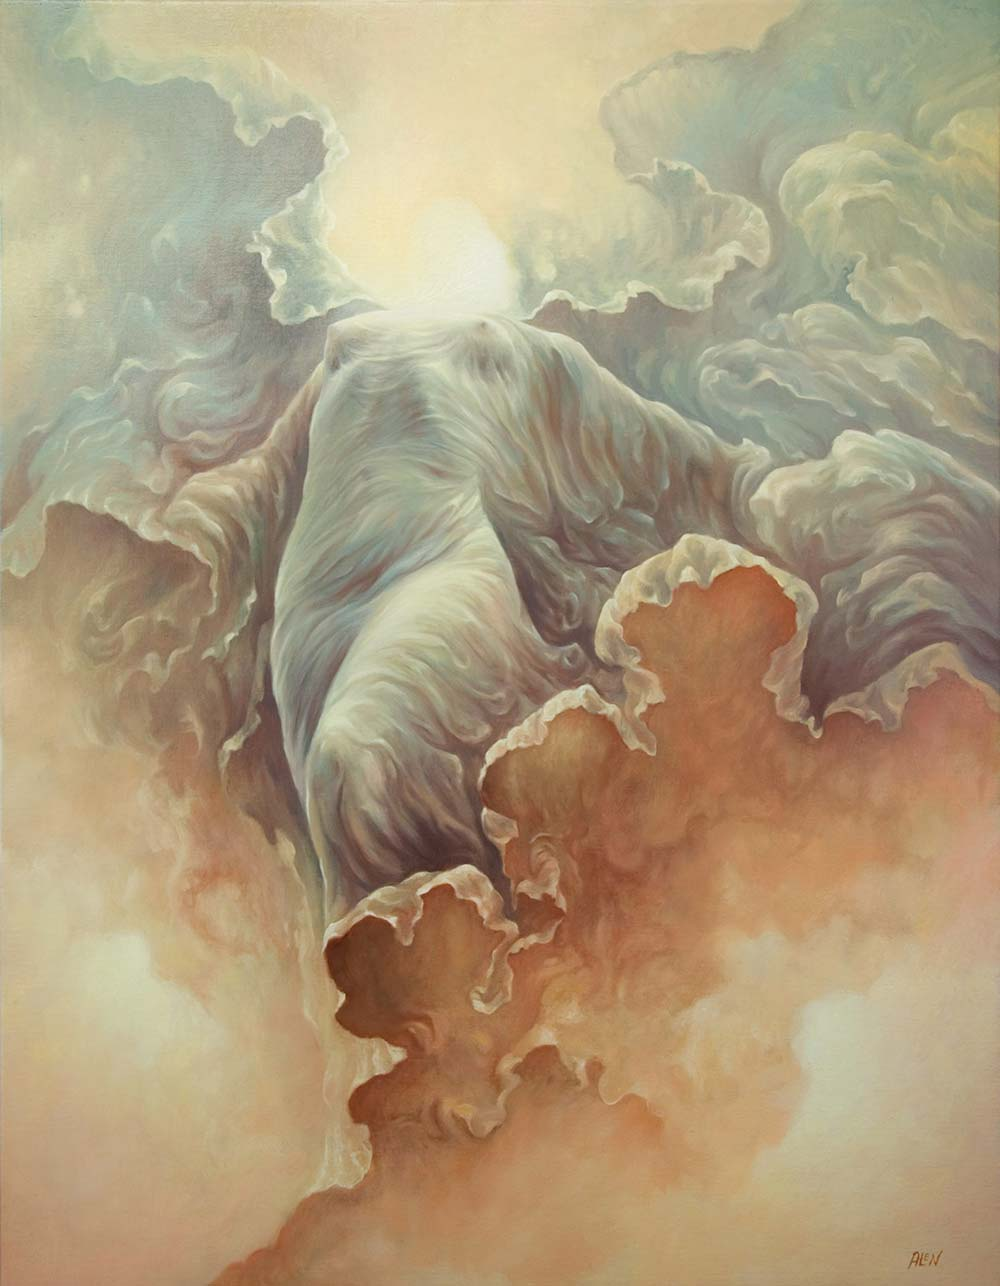 surreal-art-for-sale-tomasz-alen-kopera-ascension-743